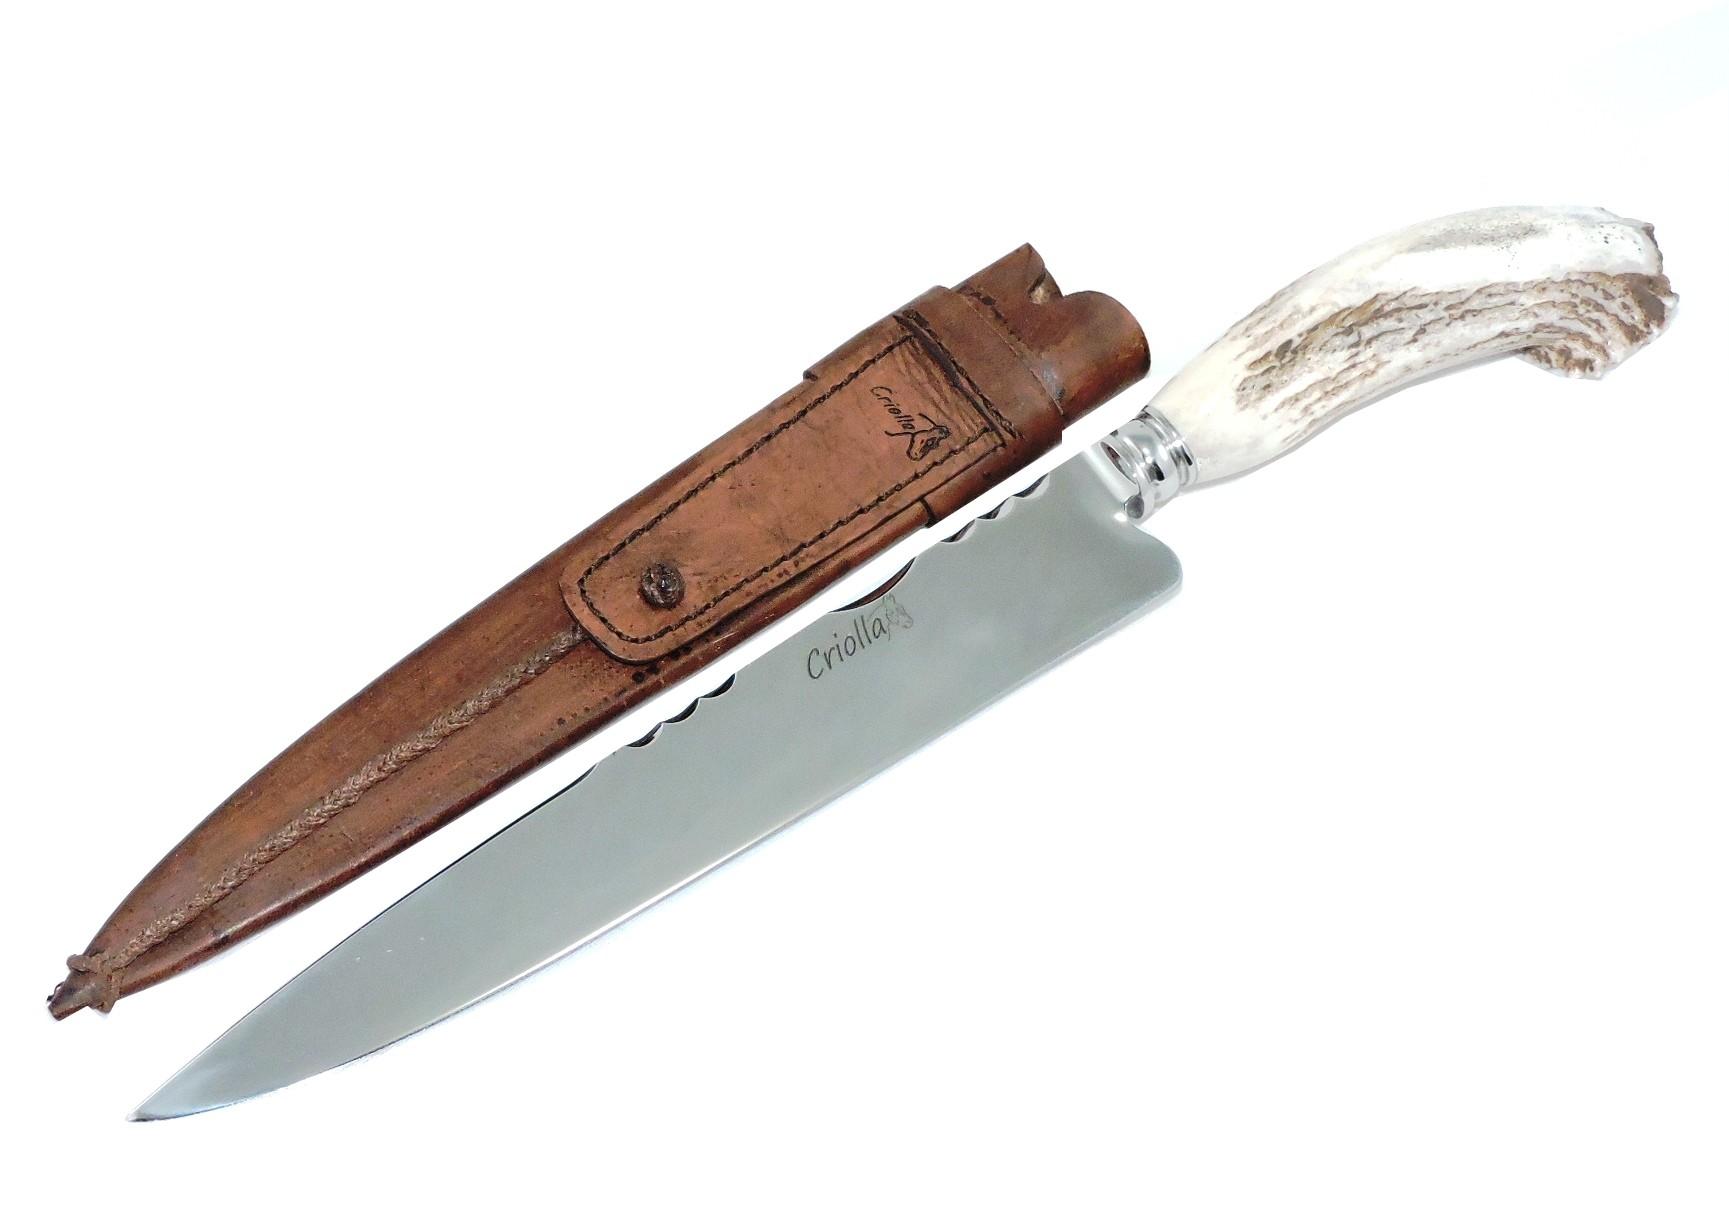 faca-churrasco-ga-cha-cabo-cervo-c-roseta-10-pol-2-.jpg